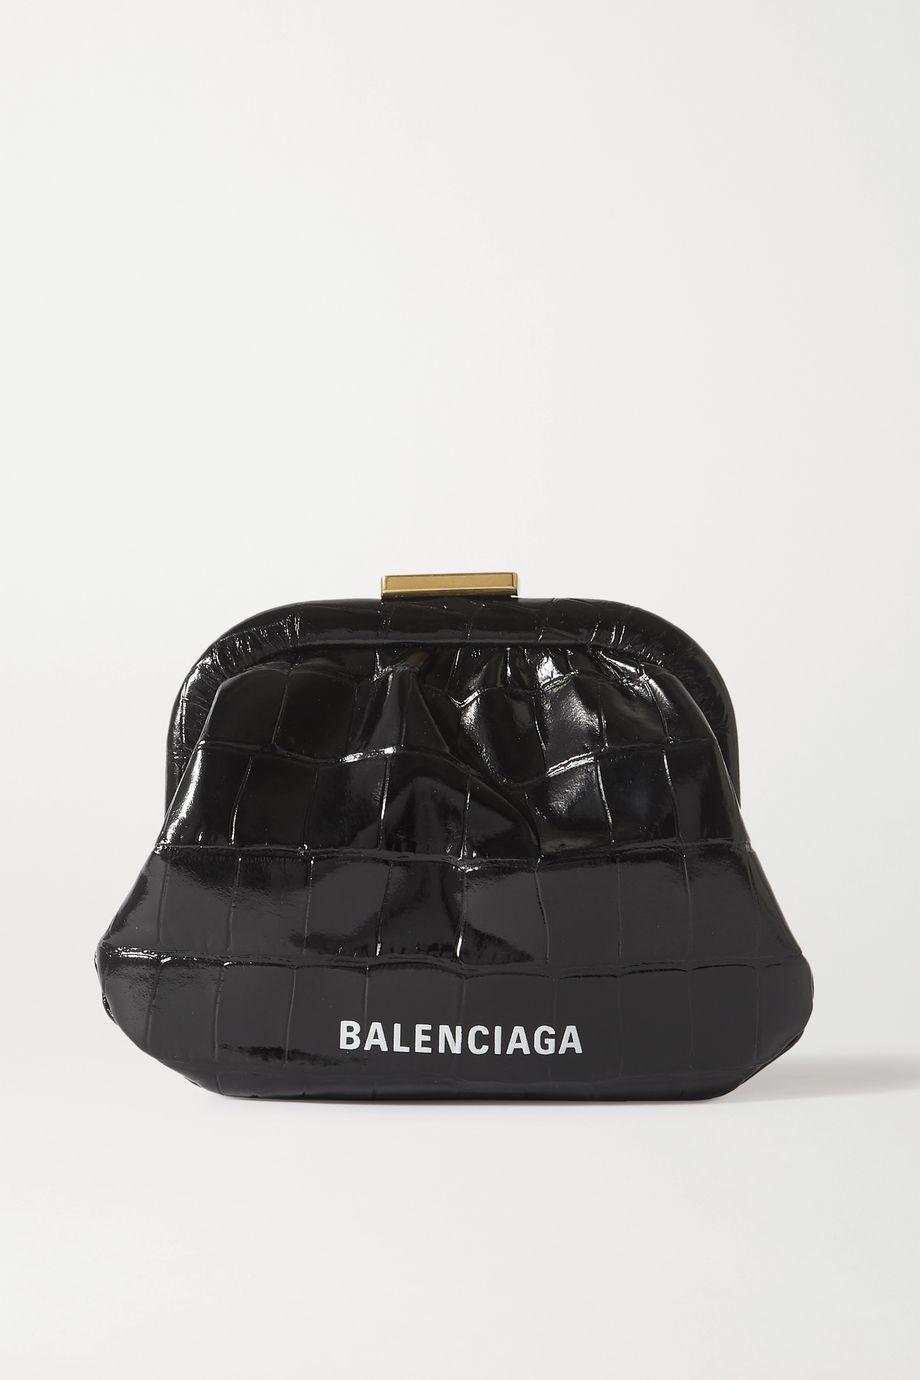 Balenciaga Pochette en cuir effet croco imprimé Cloud